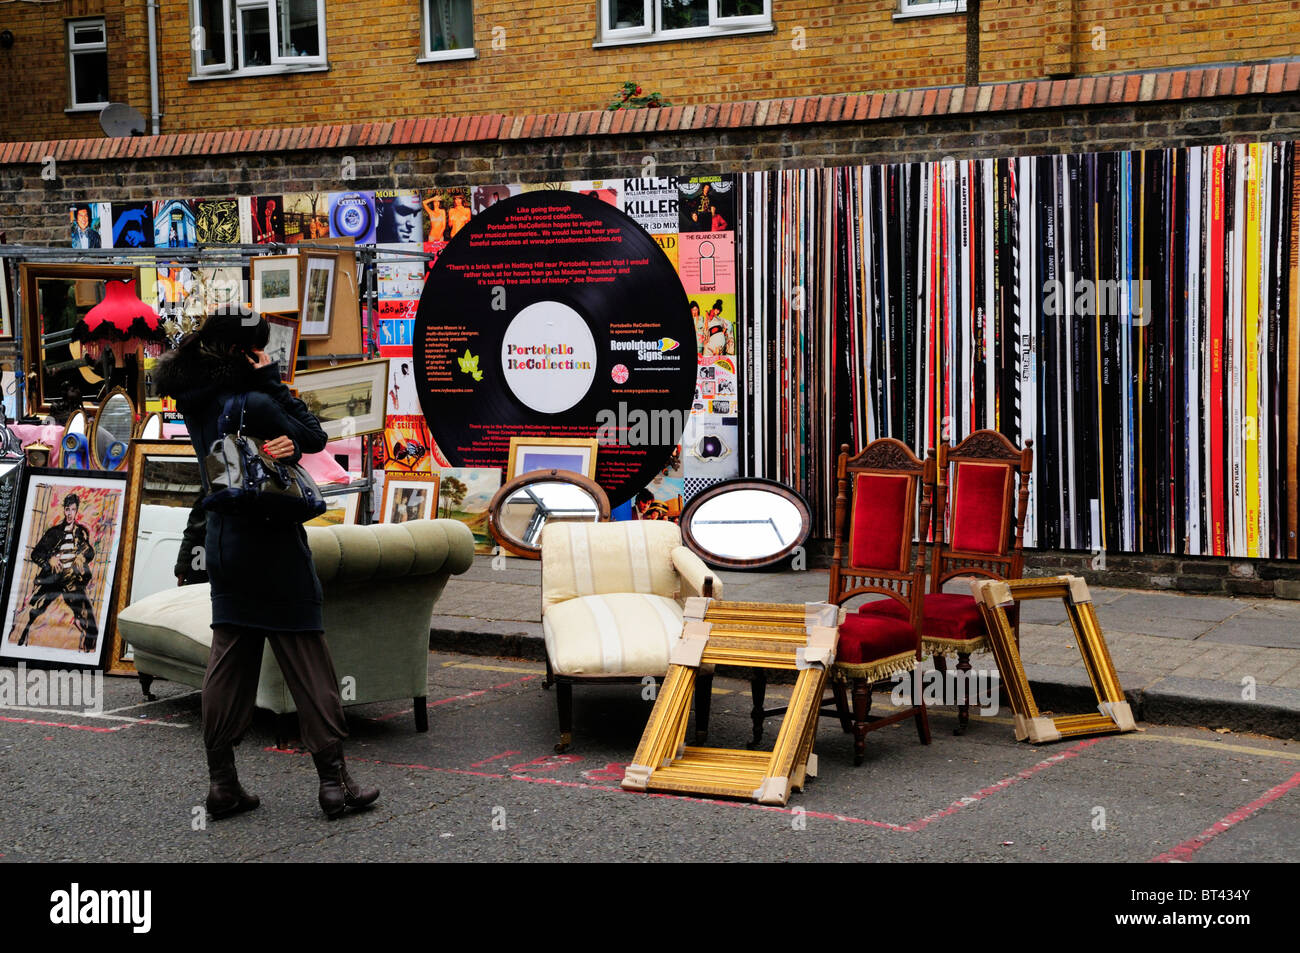 Portobello ReCollection wall decorated as LP Vinyl Record Album Covers, Portobello Road, Notting Hill, London, England, - Stock Image